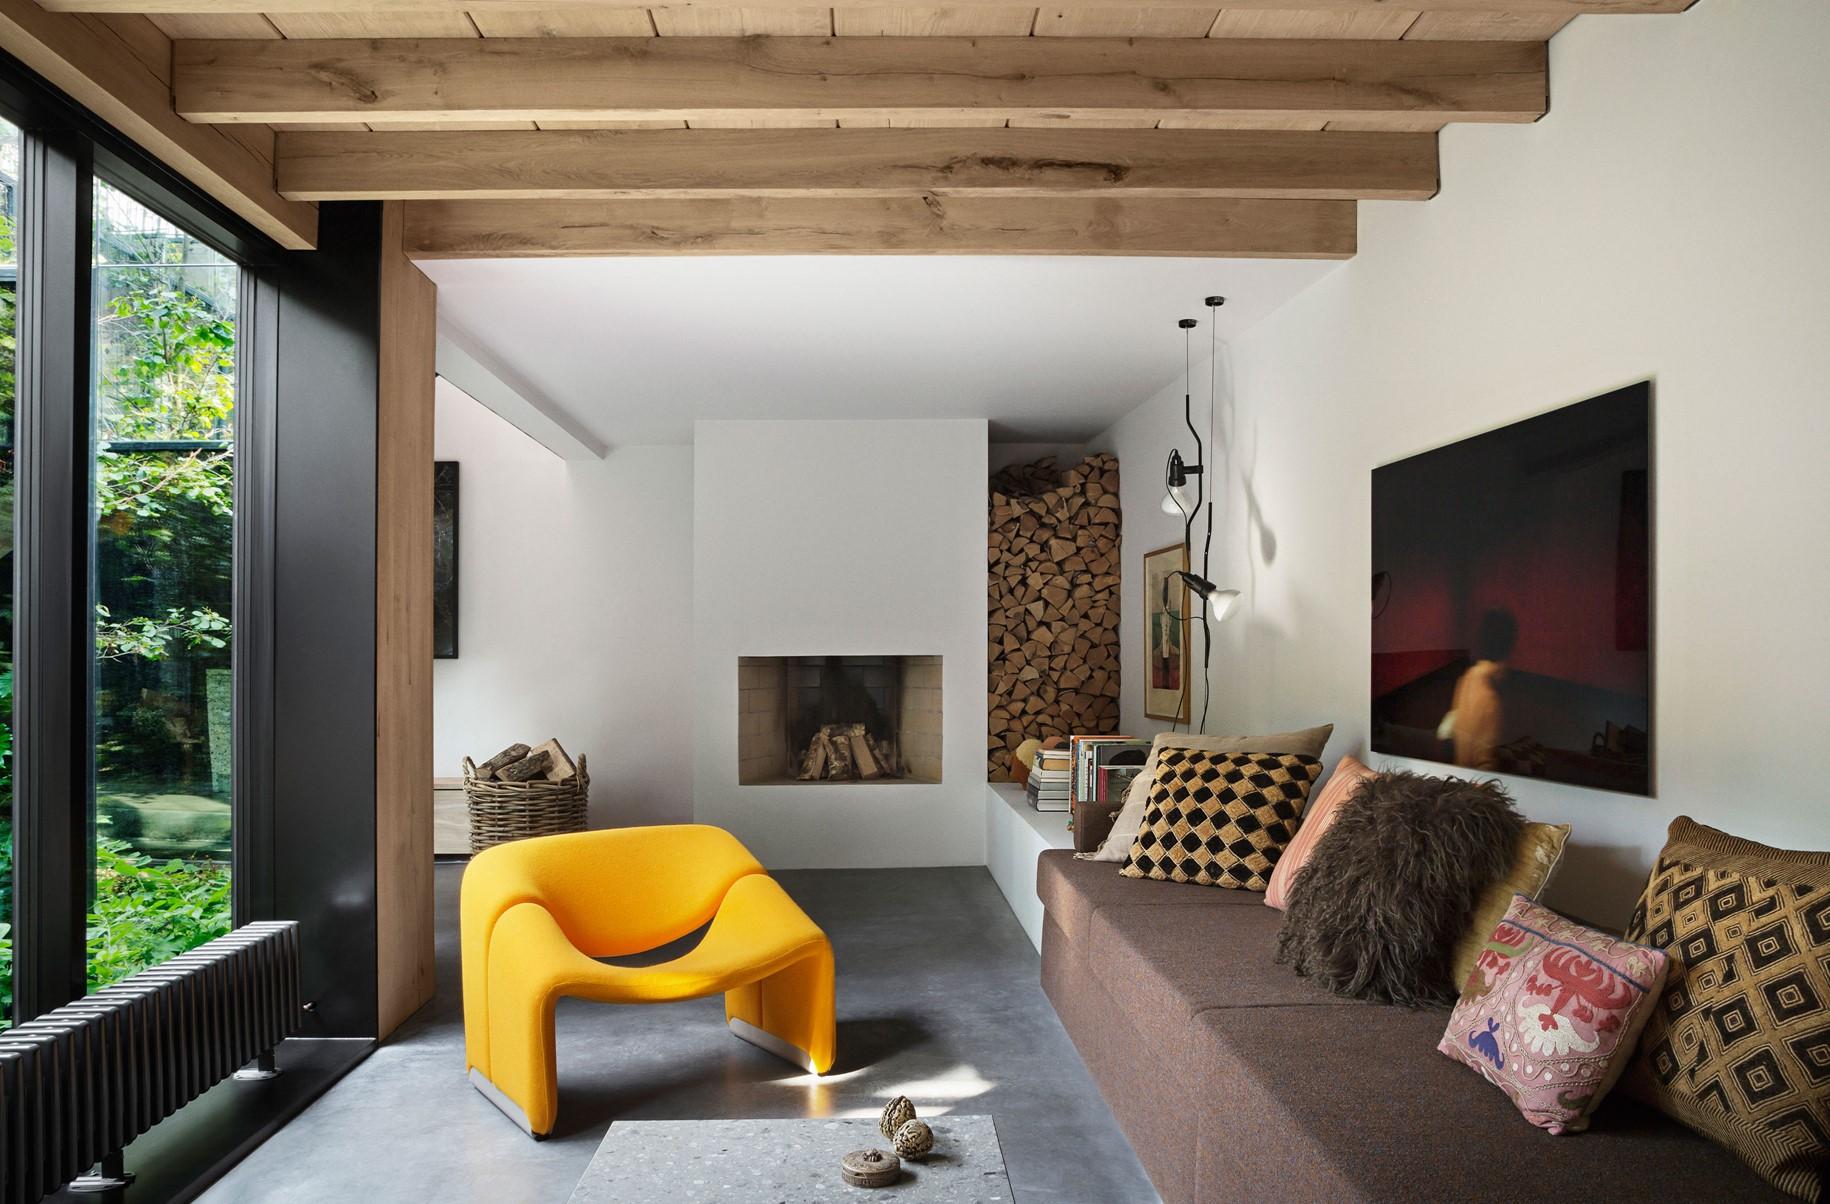 oak-hardwood-wall-cladding-heartoak_natural-oil_peters-house_living-room_dinesen.jpg